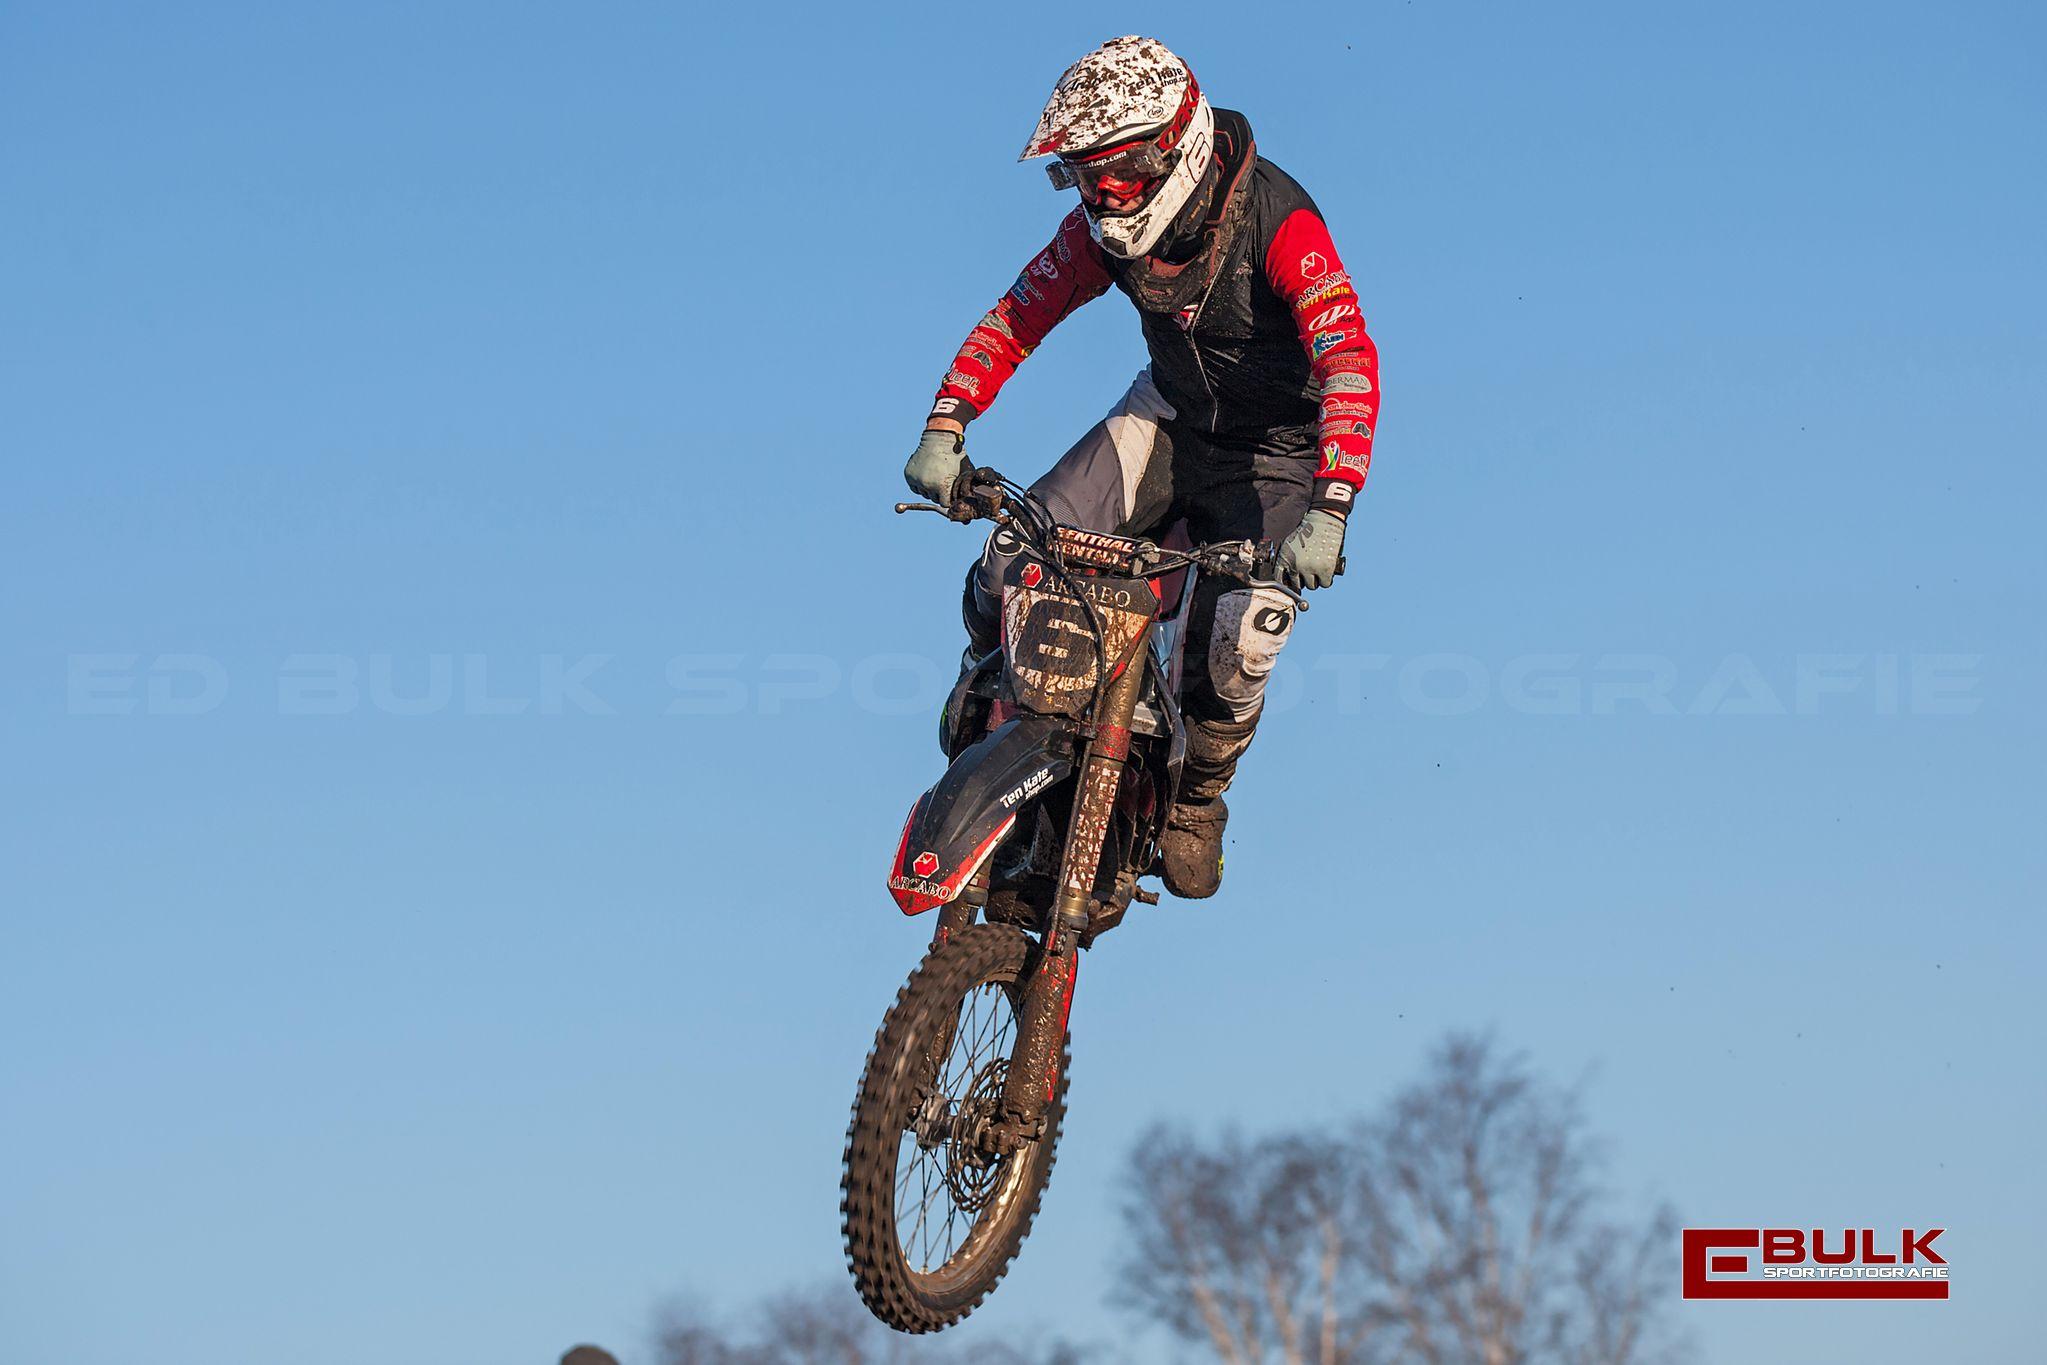 ebs_0002-ed_bulk_sportfotografie